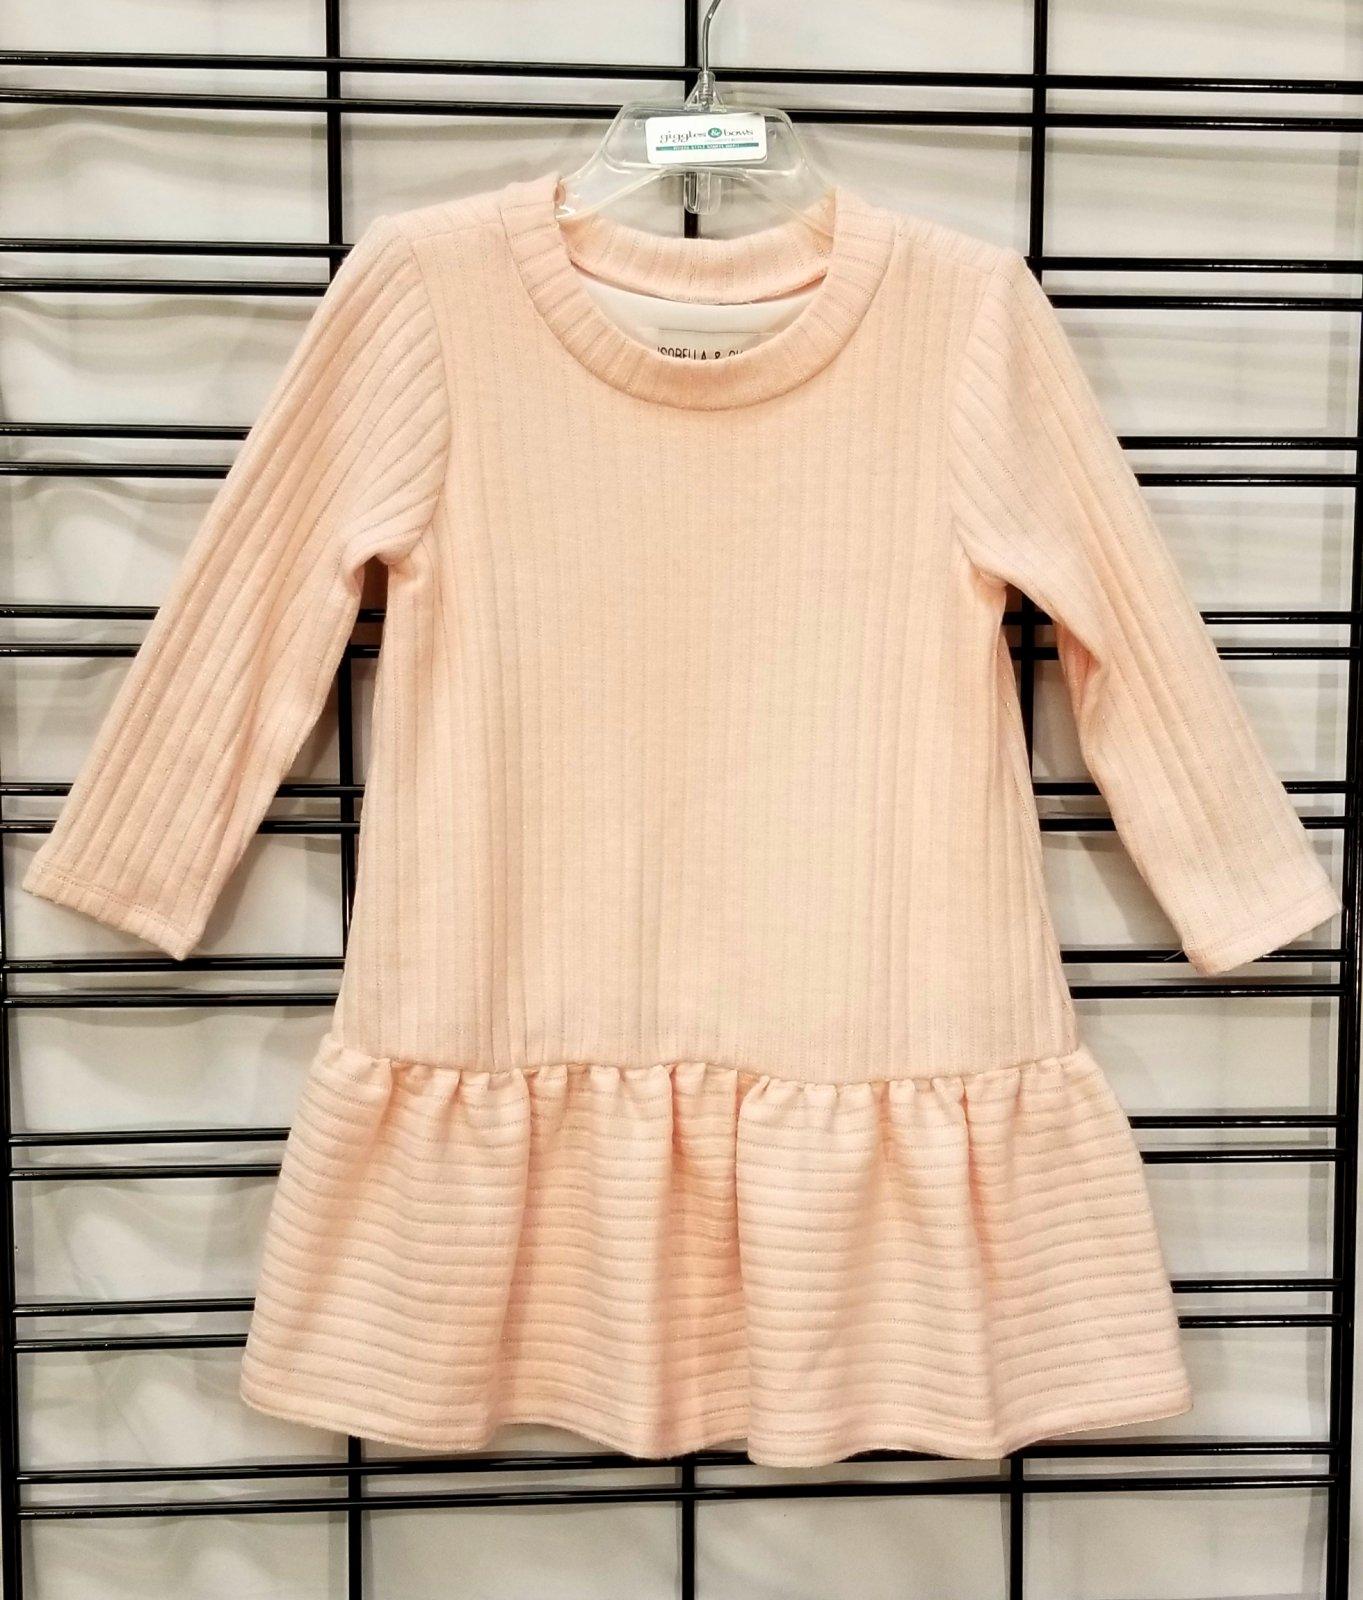 ISOBELLA & CHLOE - Pink Sparkle Dress